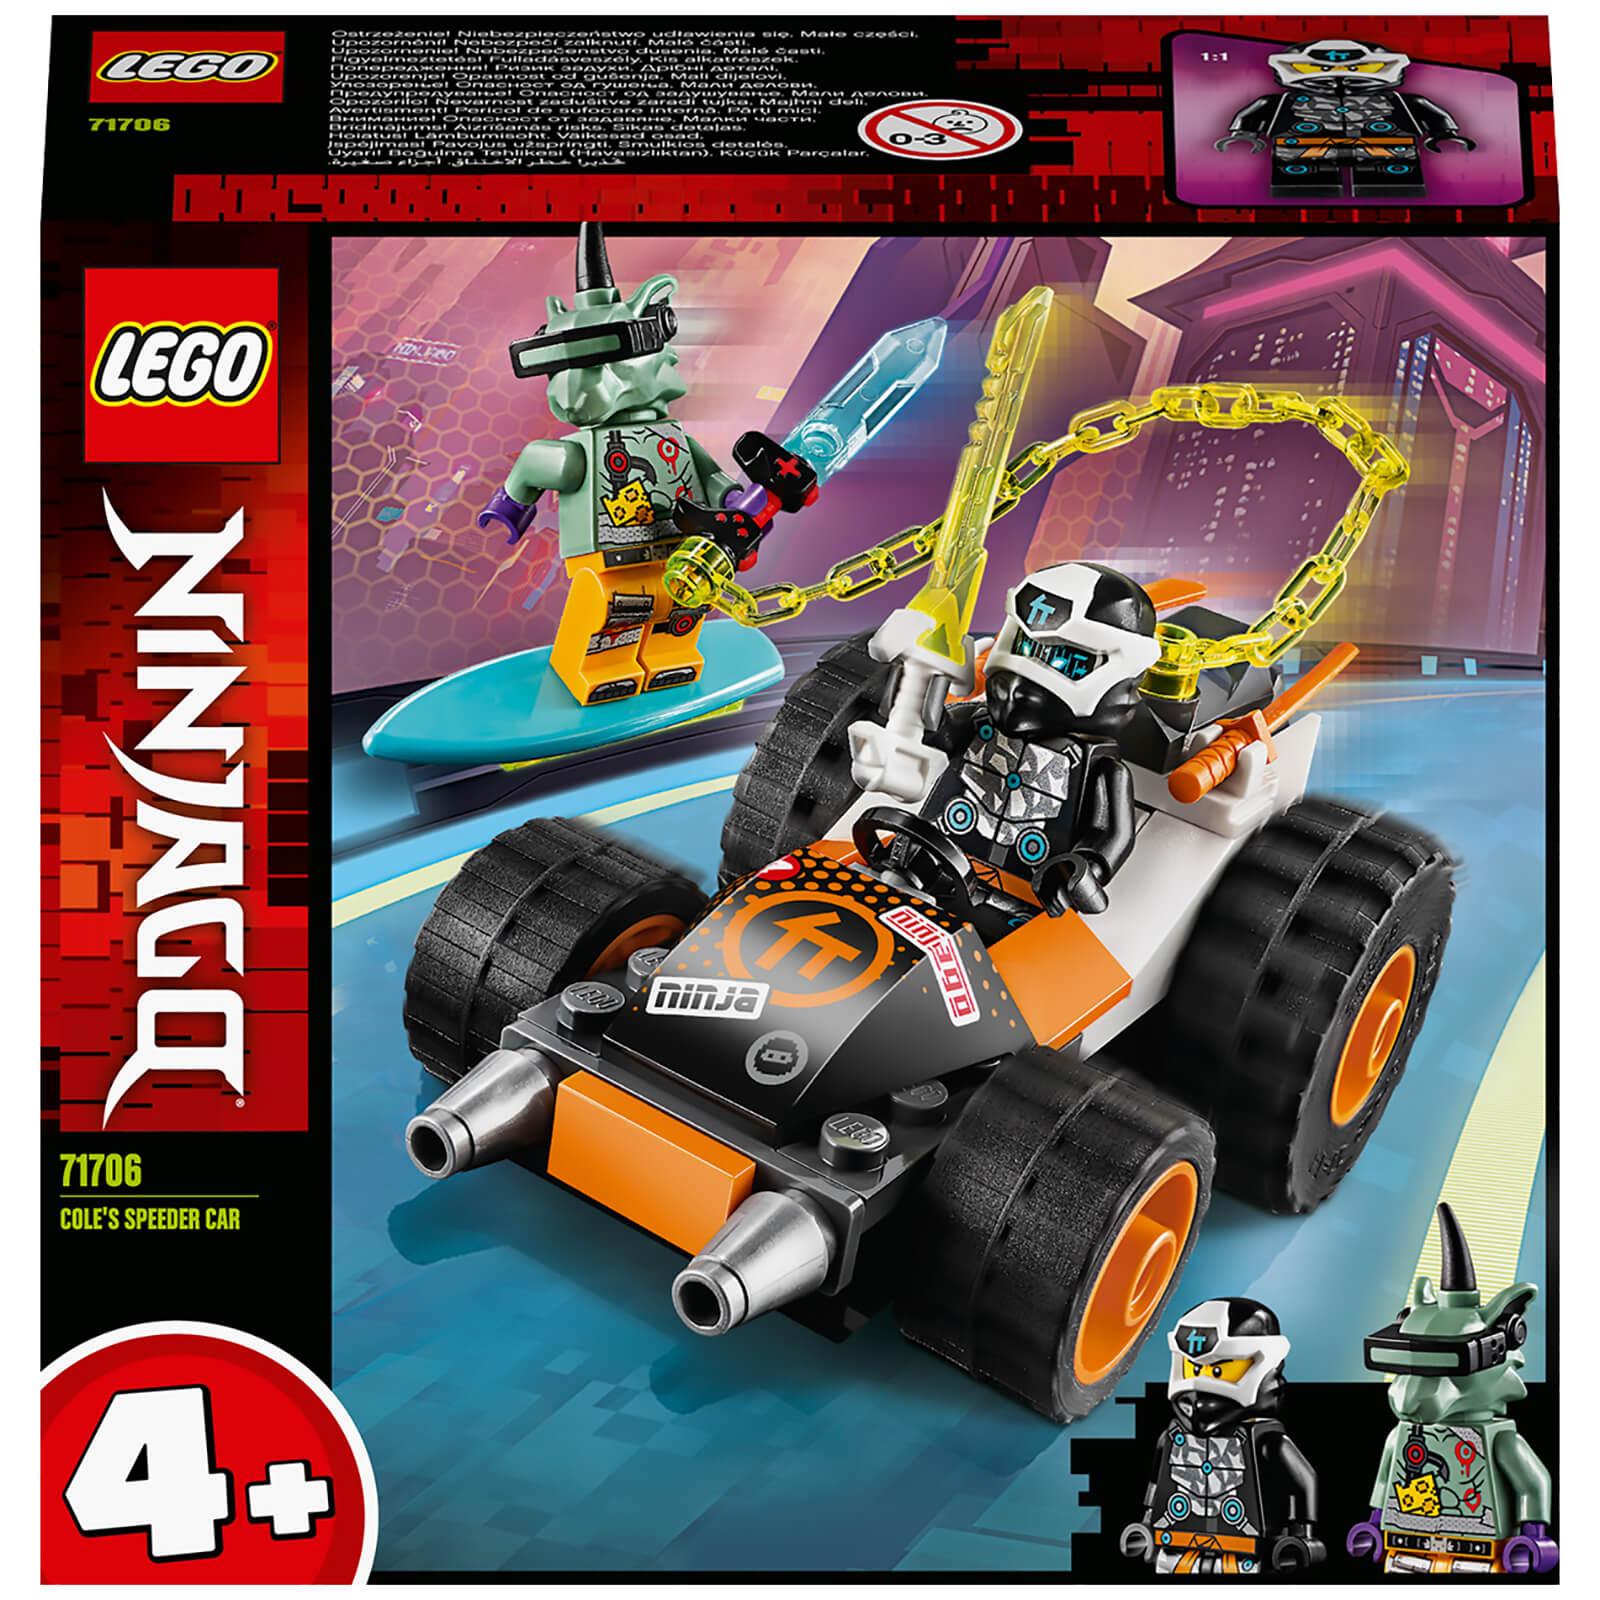 Image of 71706 LEGO® NINJAGO Coles Speeder